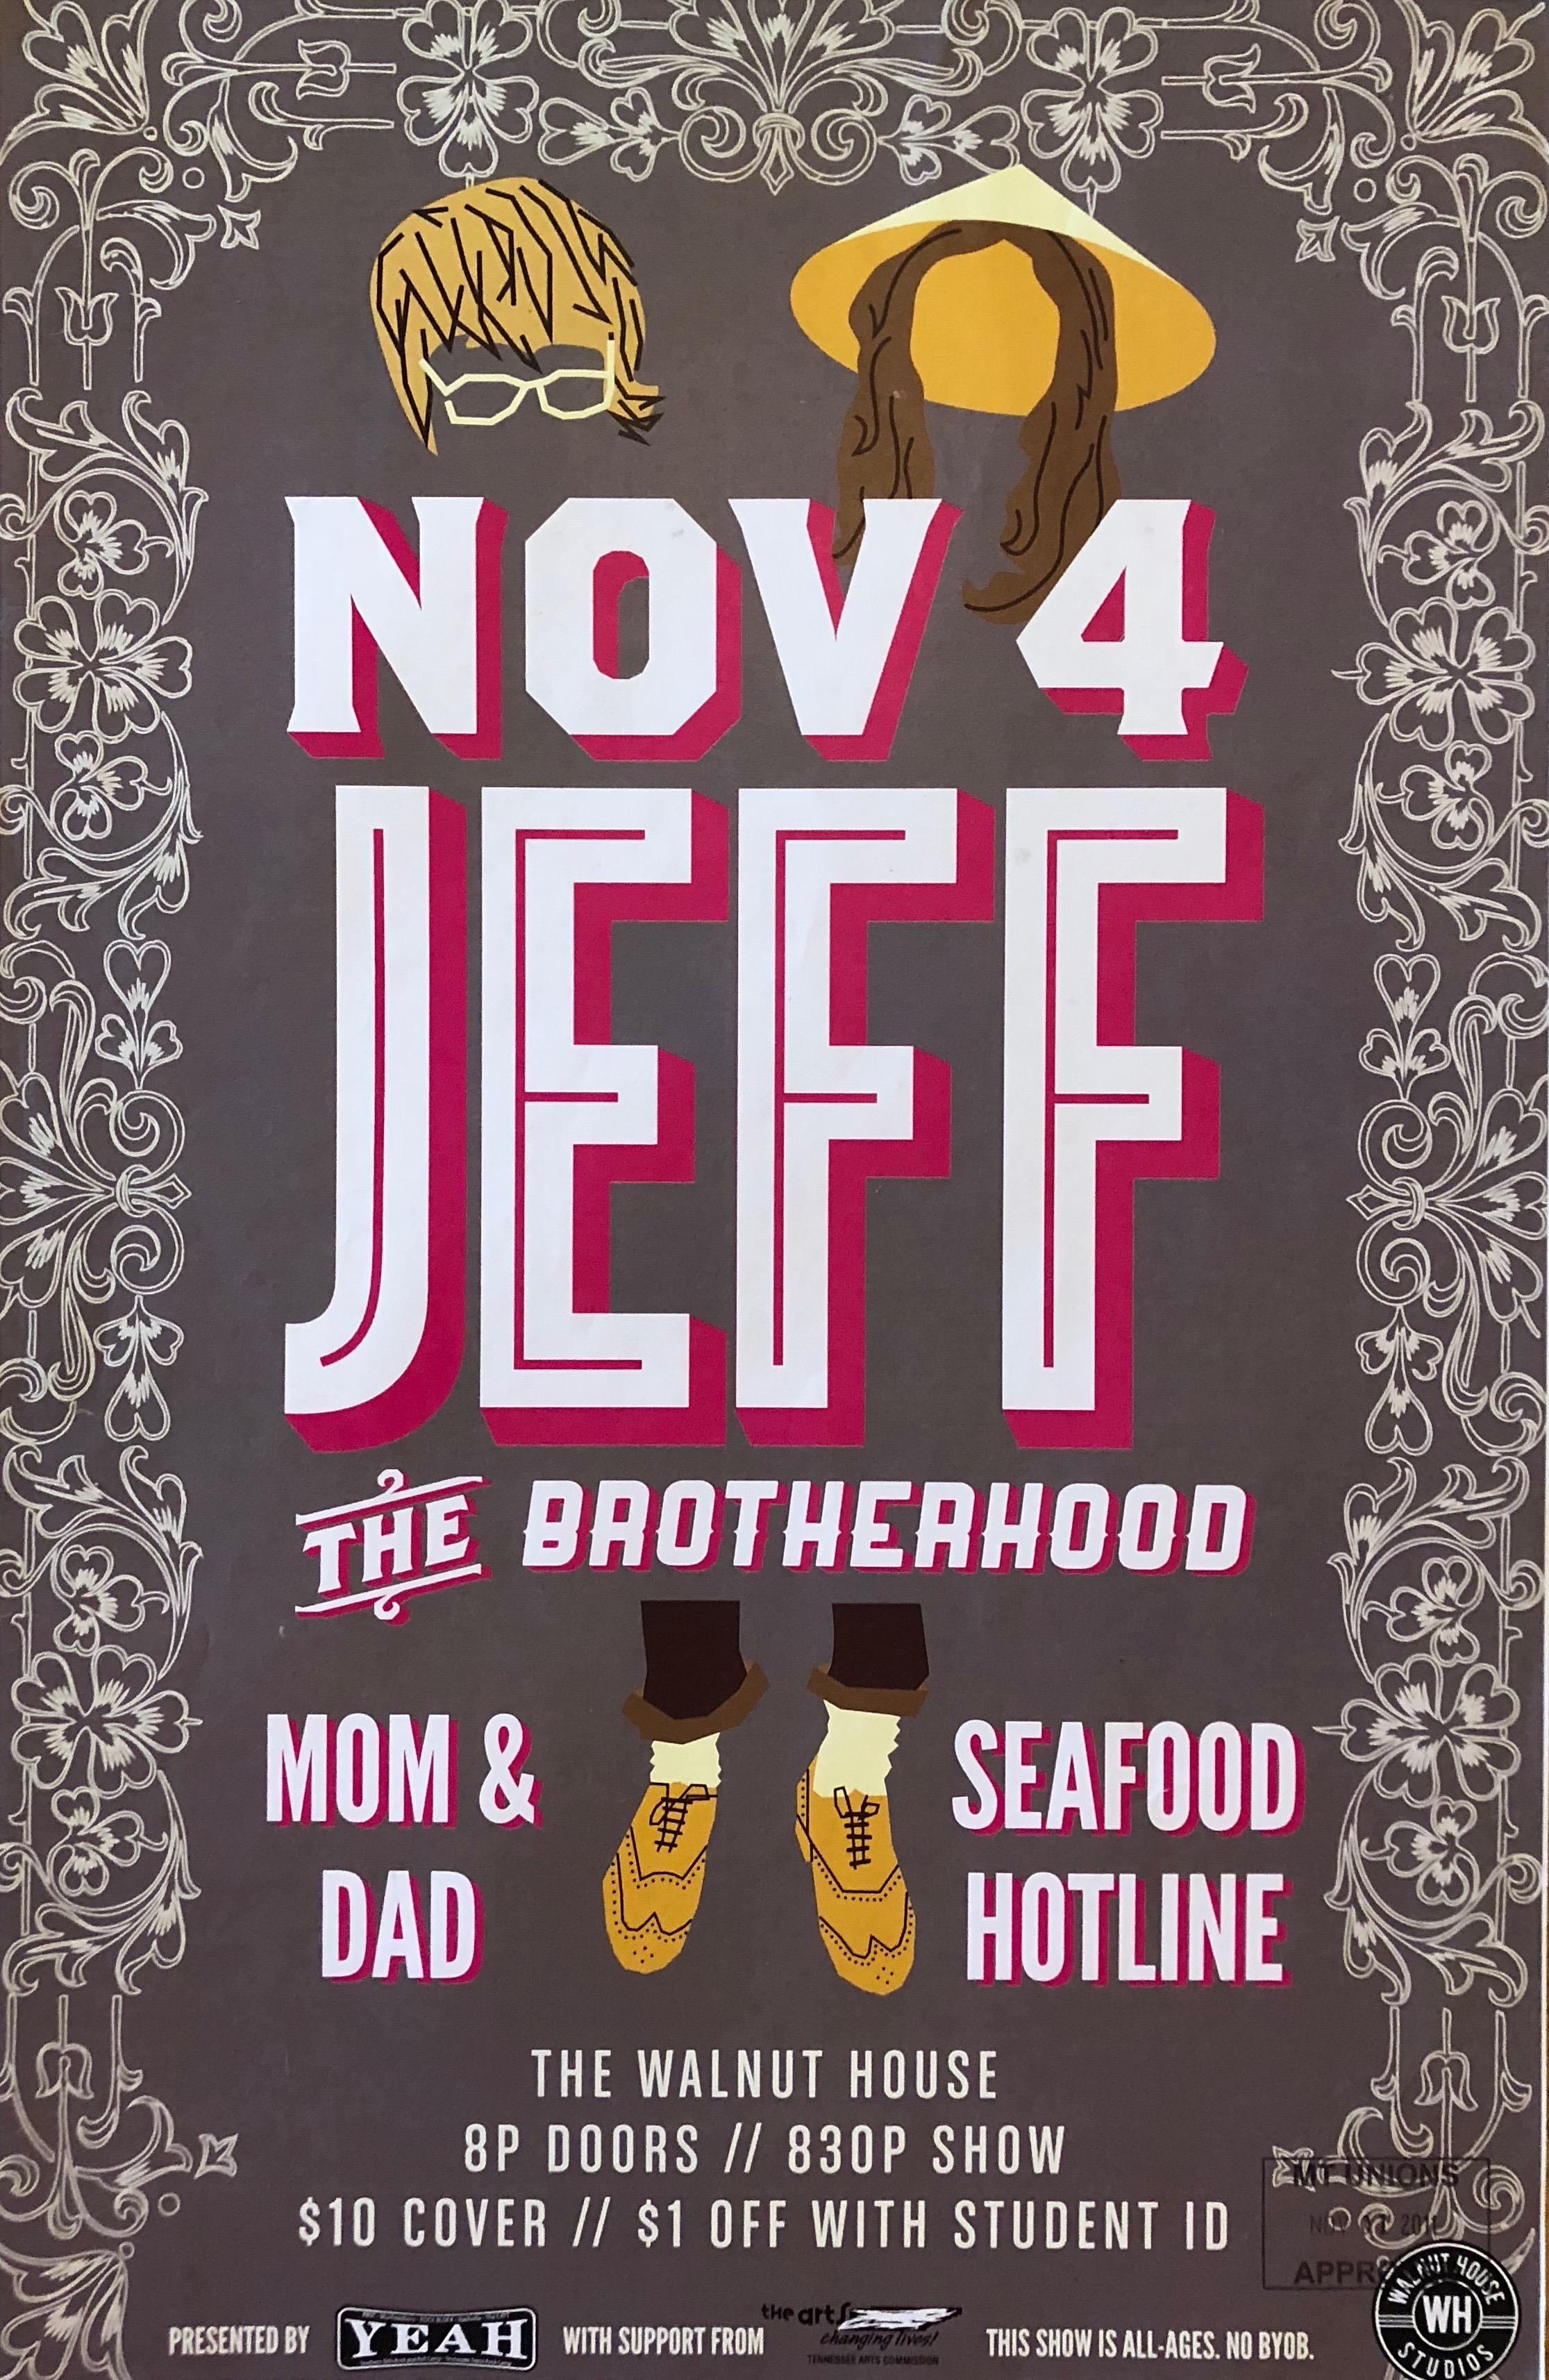 JEFF The Brotherhood, Mom & Dad, Murfreesboro Walnut House